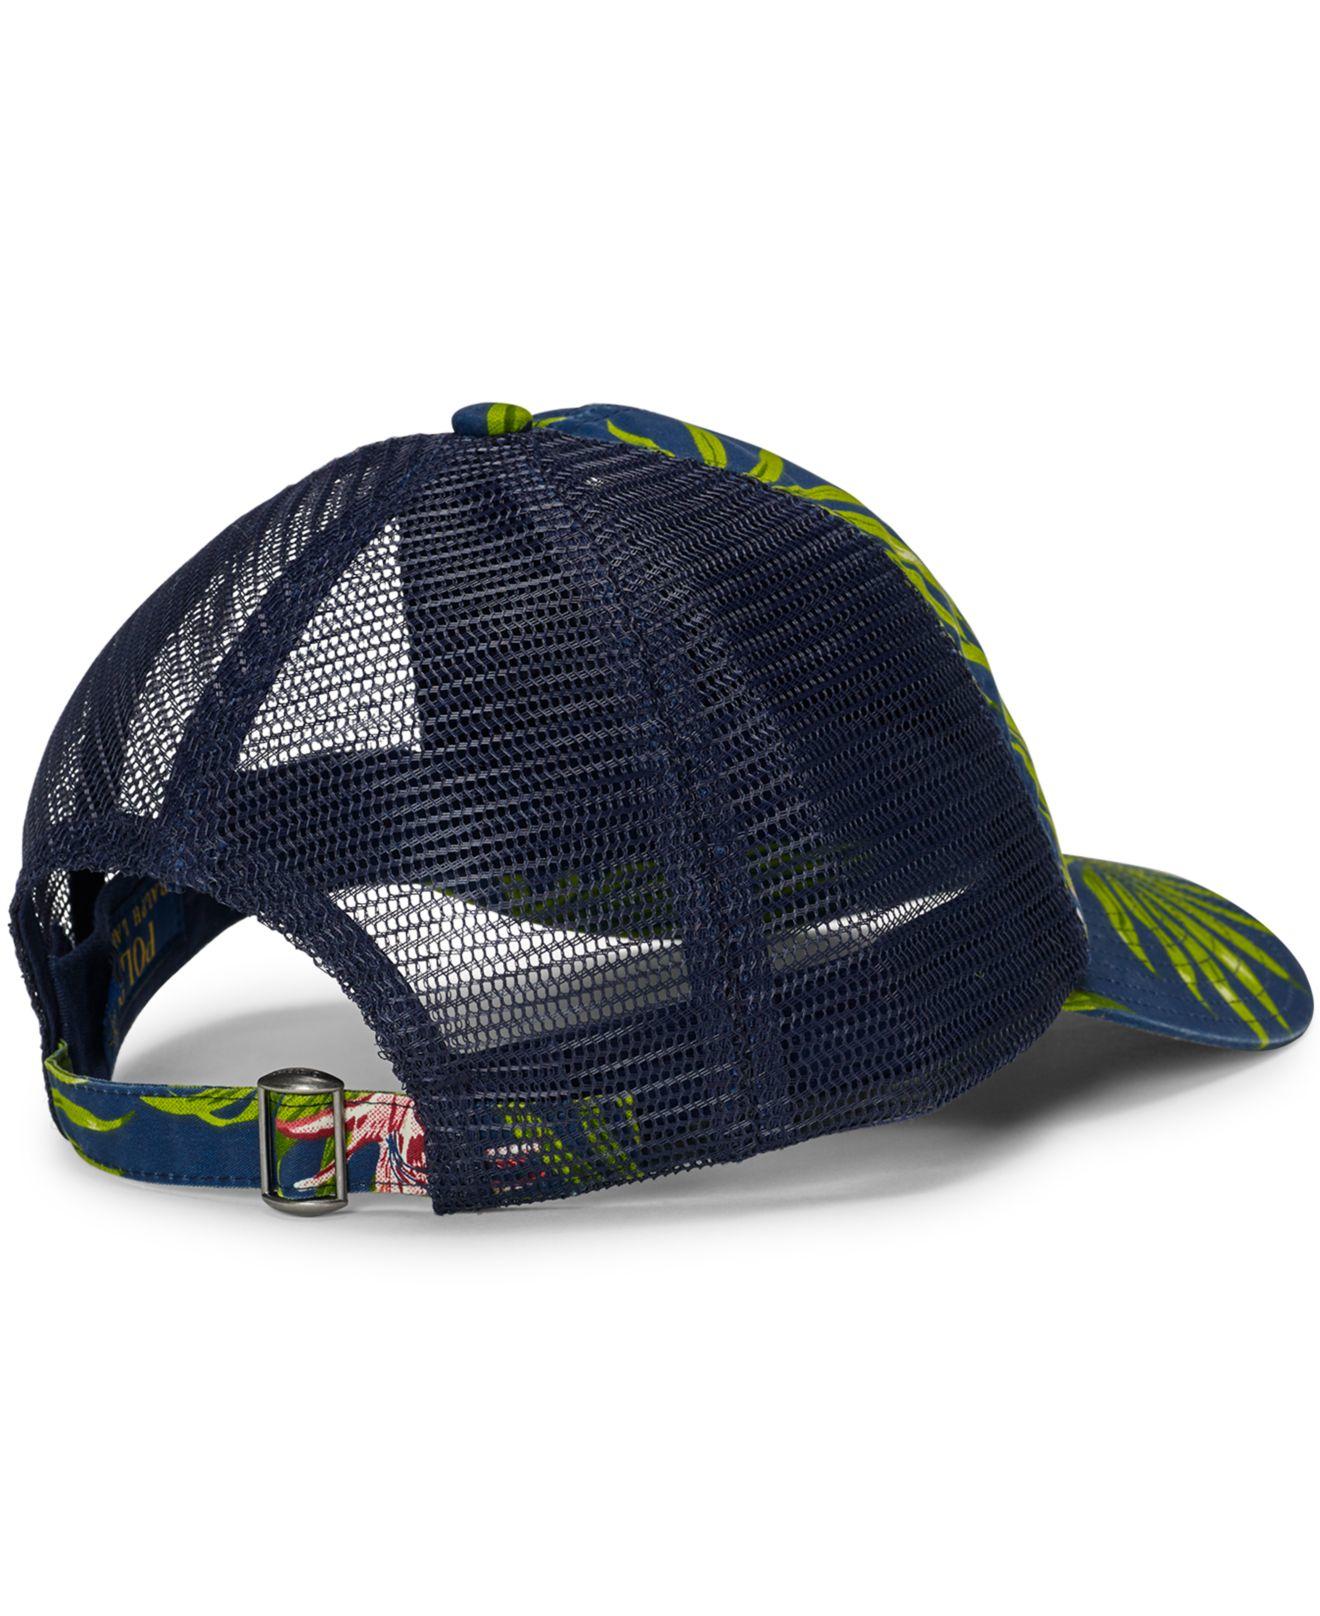 0f89106bc35 polo-ralph-lauren-trumpet-navy-floral-print-trucker-hat -blue-product-1-170665180-normal.jpeg